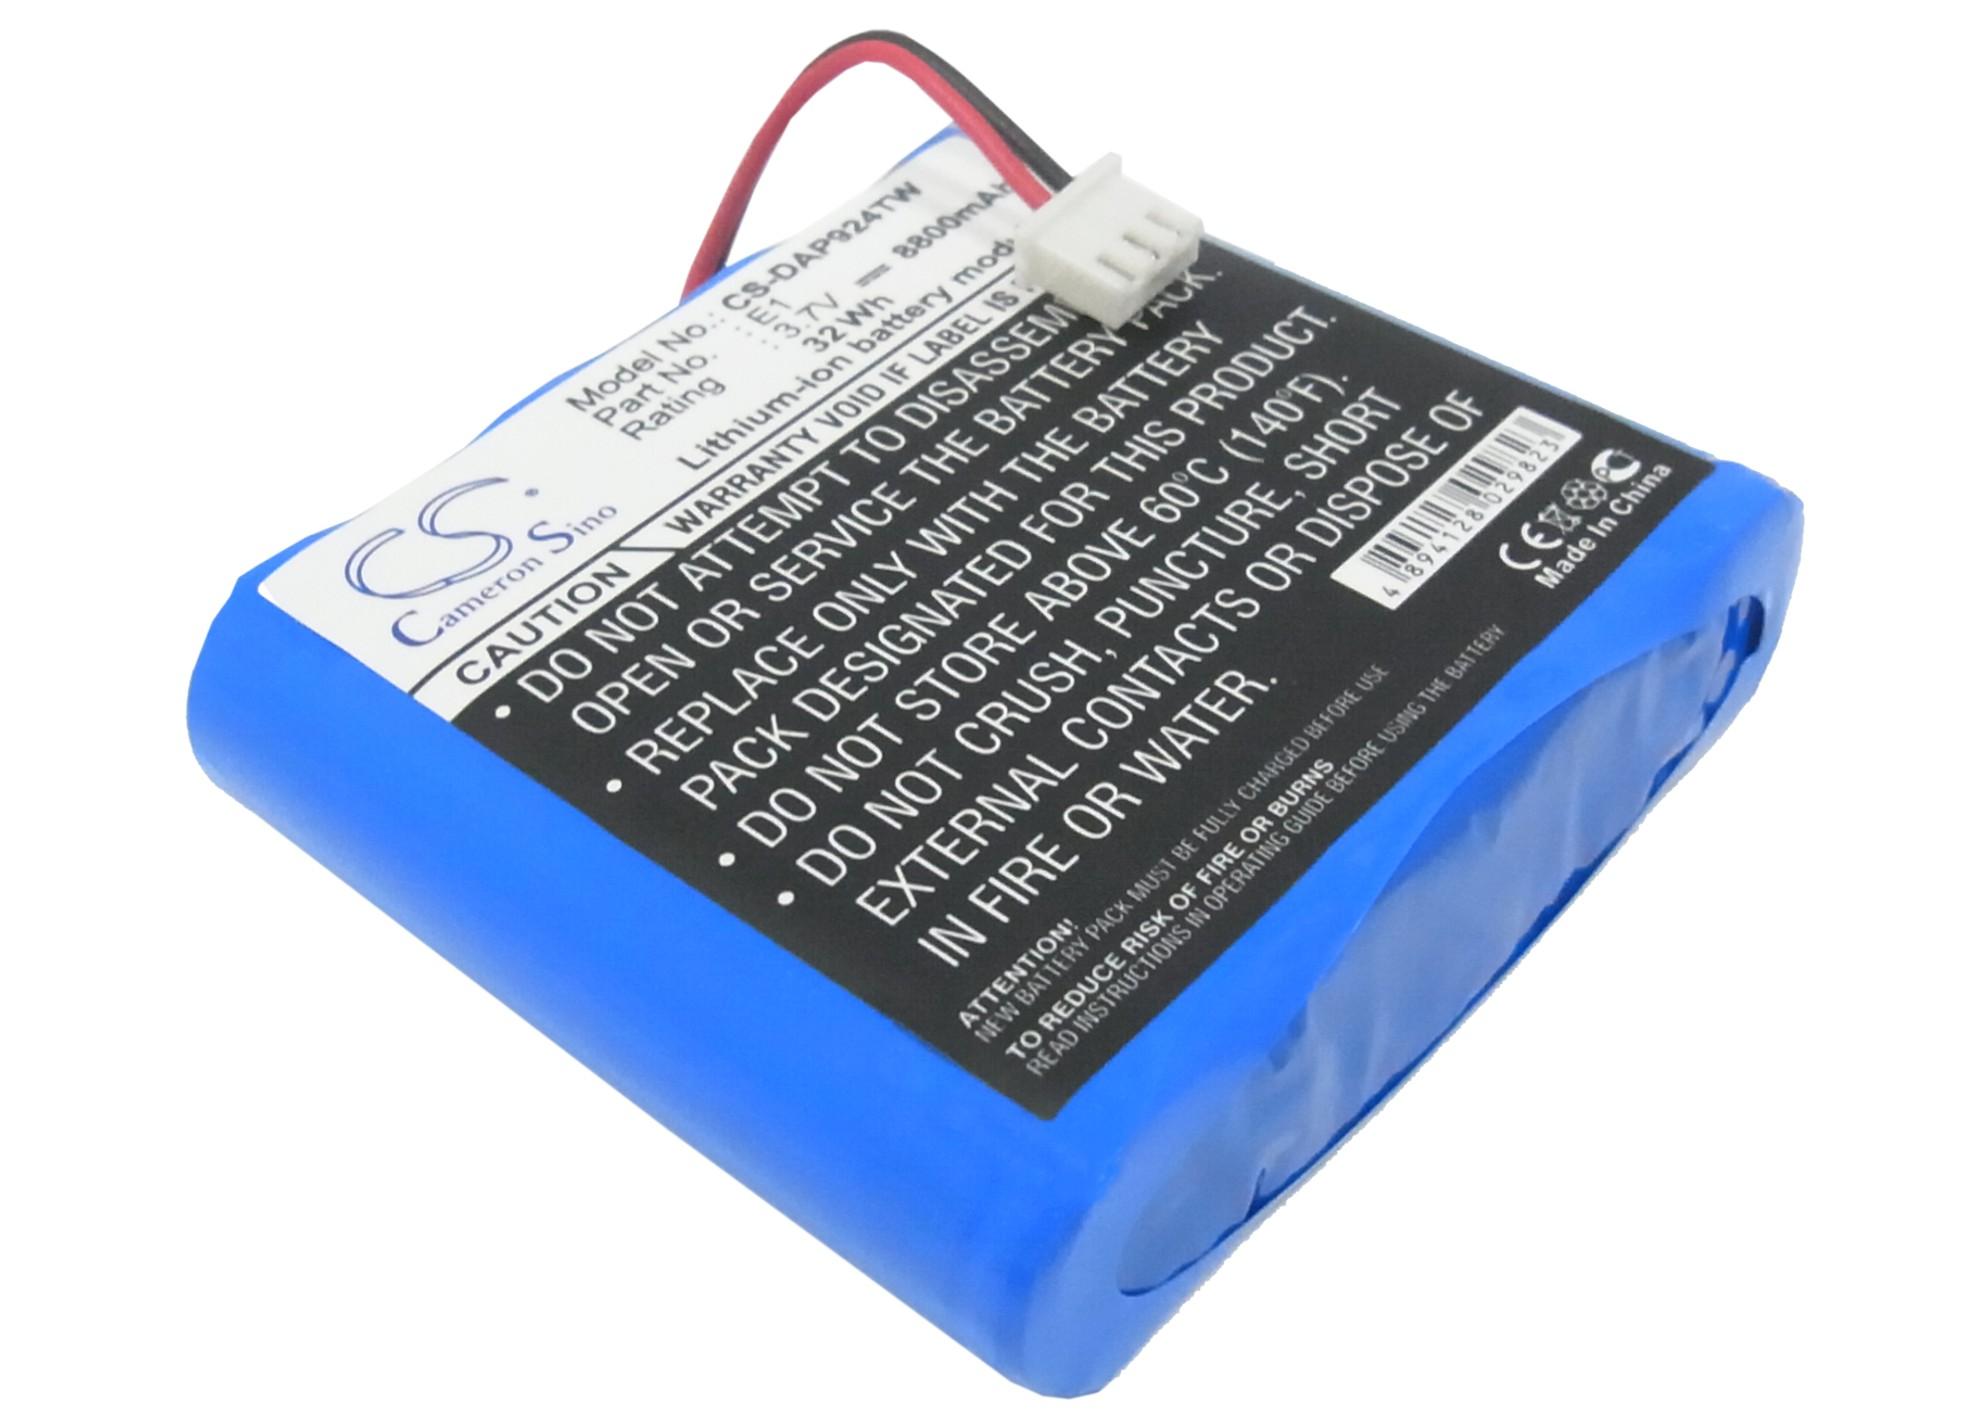 Cameron Sino baterie do digitálních rádií pro PURE EVOKE-1S Marshall 3.7V Li-ion 8800mAh modrá - neoriginální